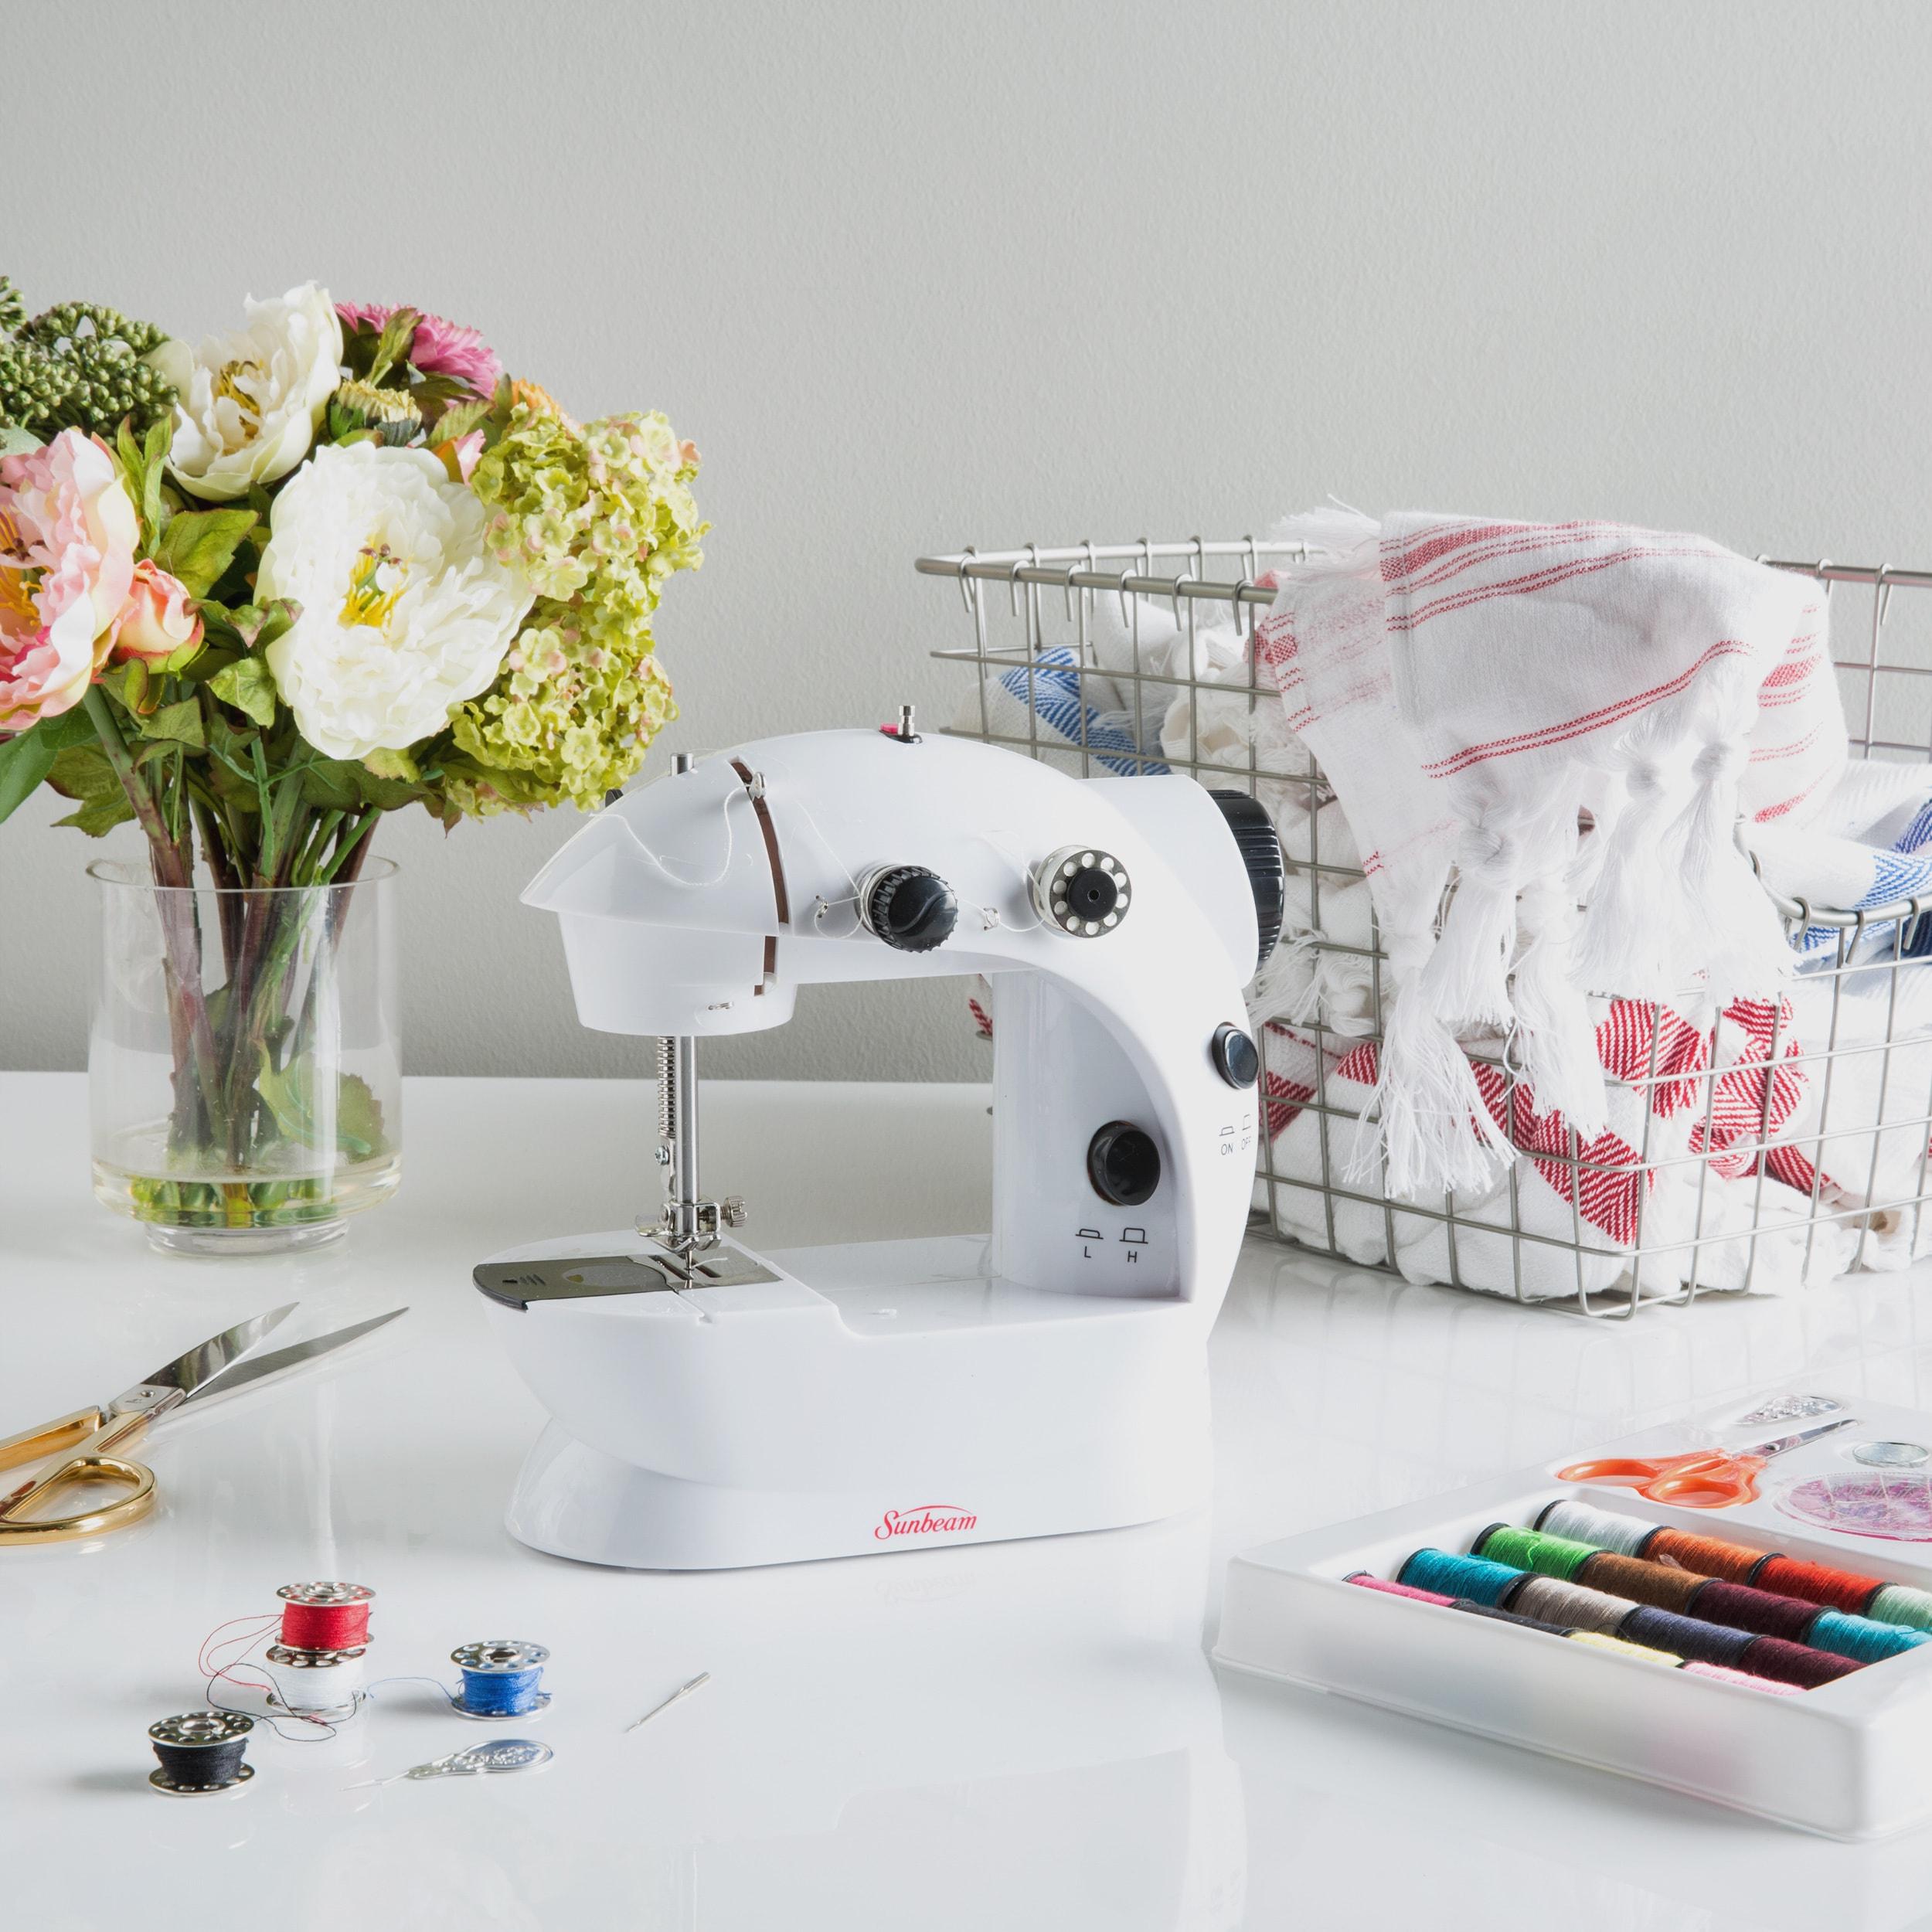 Sunbeam Mini Sewing Machine with Kit (White Mini Sewing M...